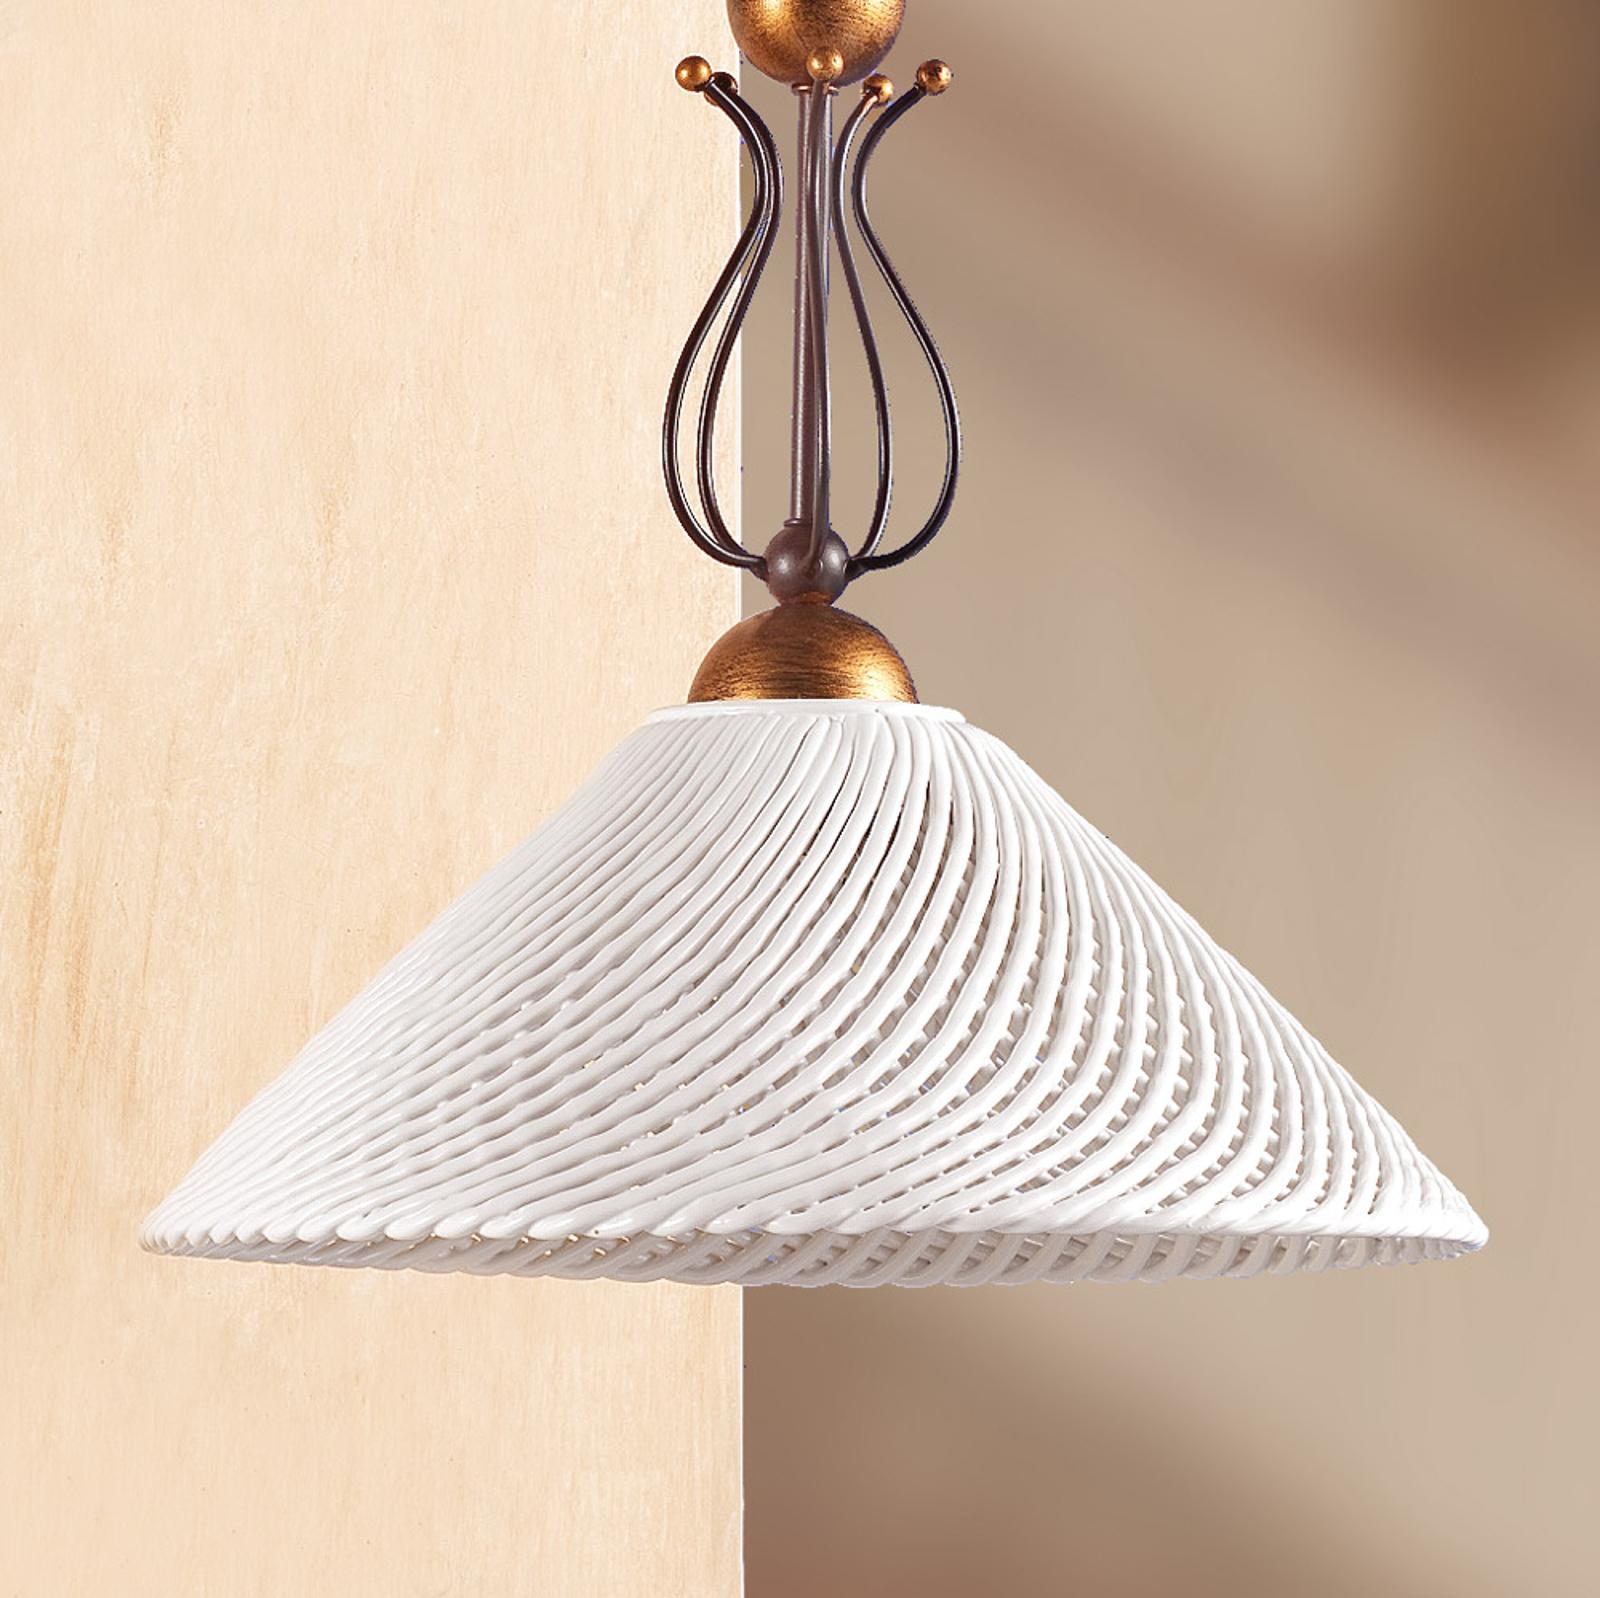 Stylish RETINA hanging light_2013044_1